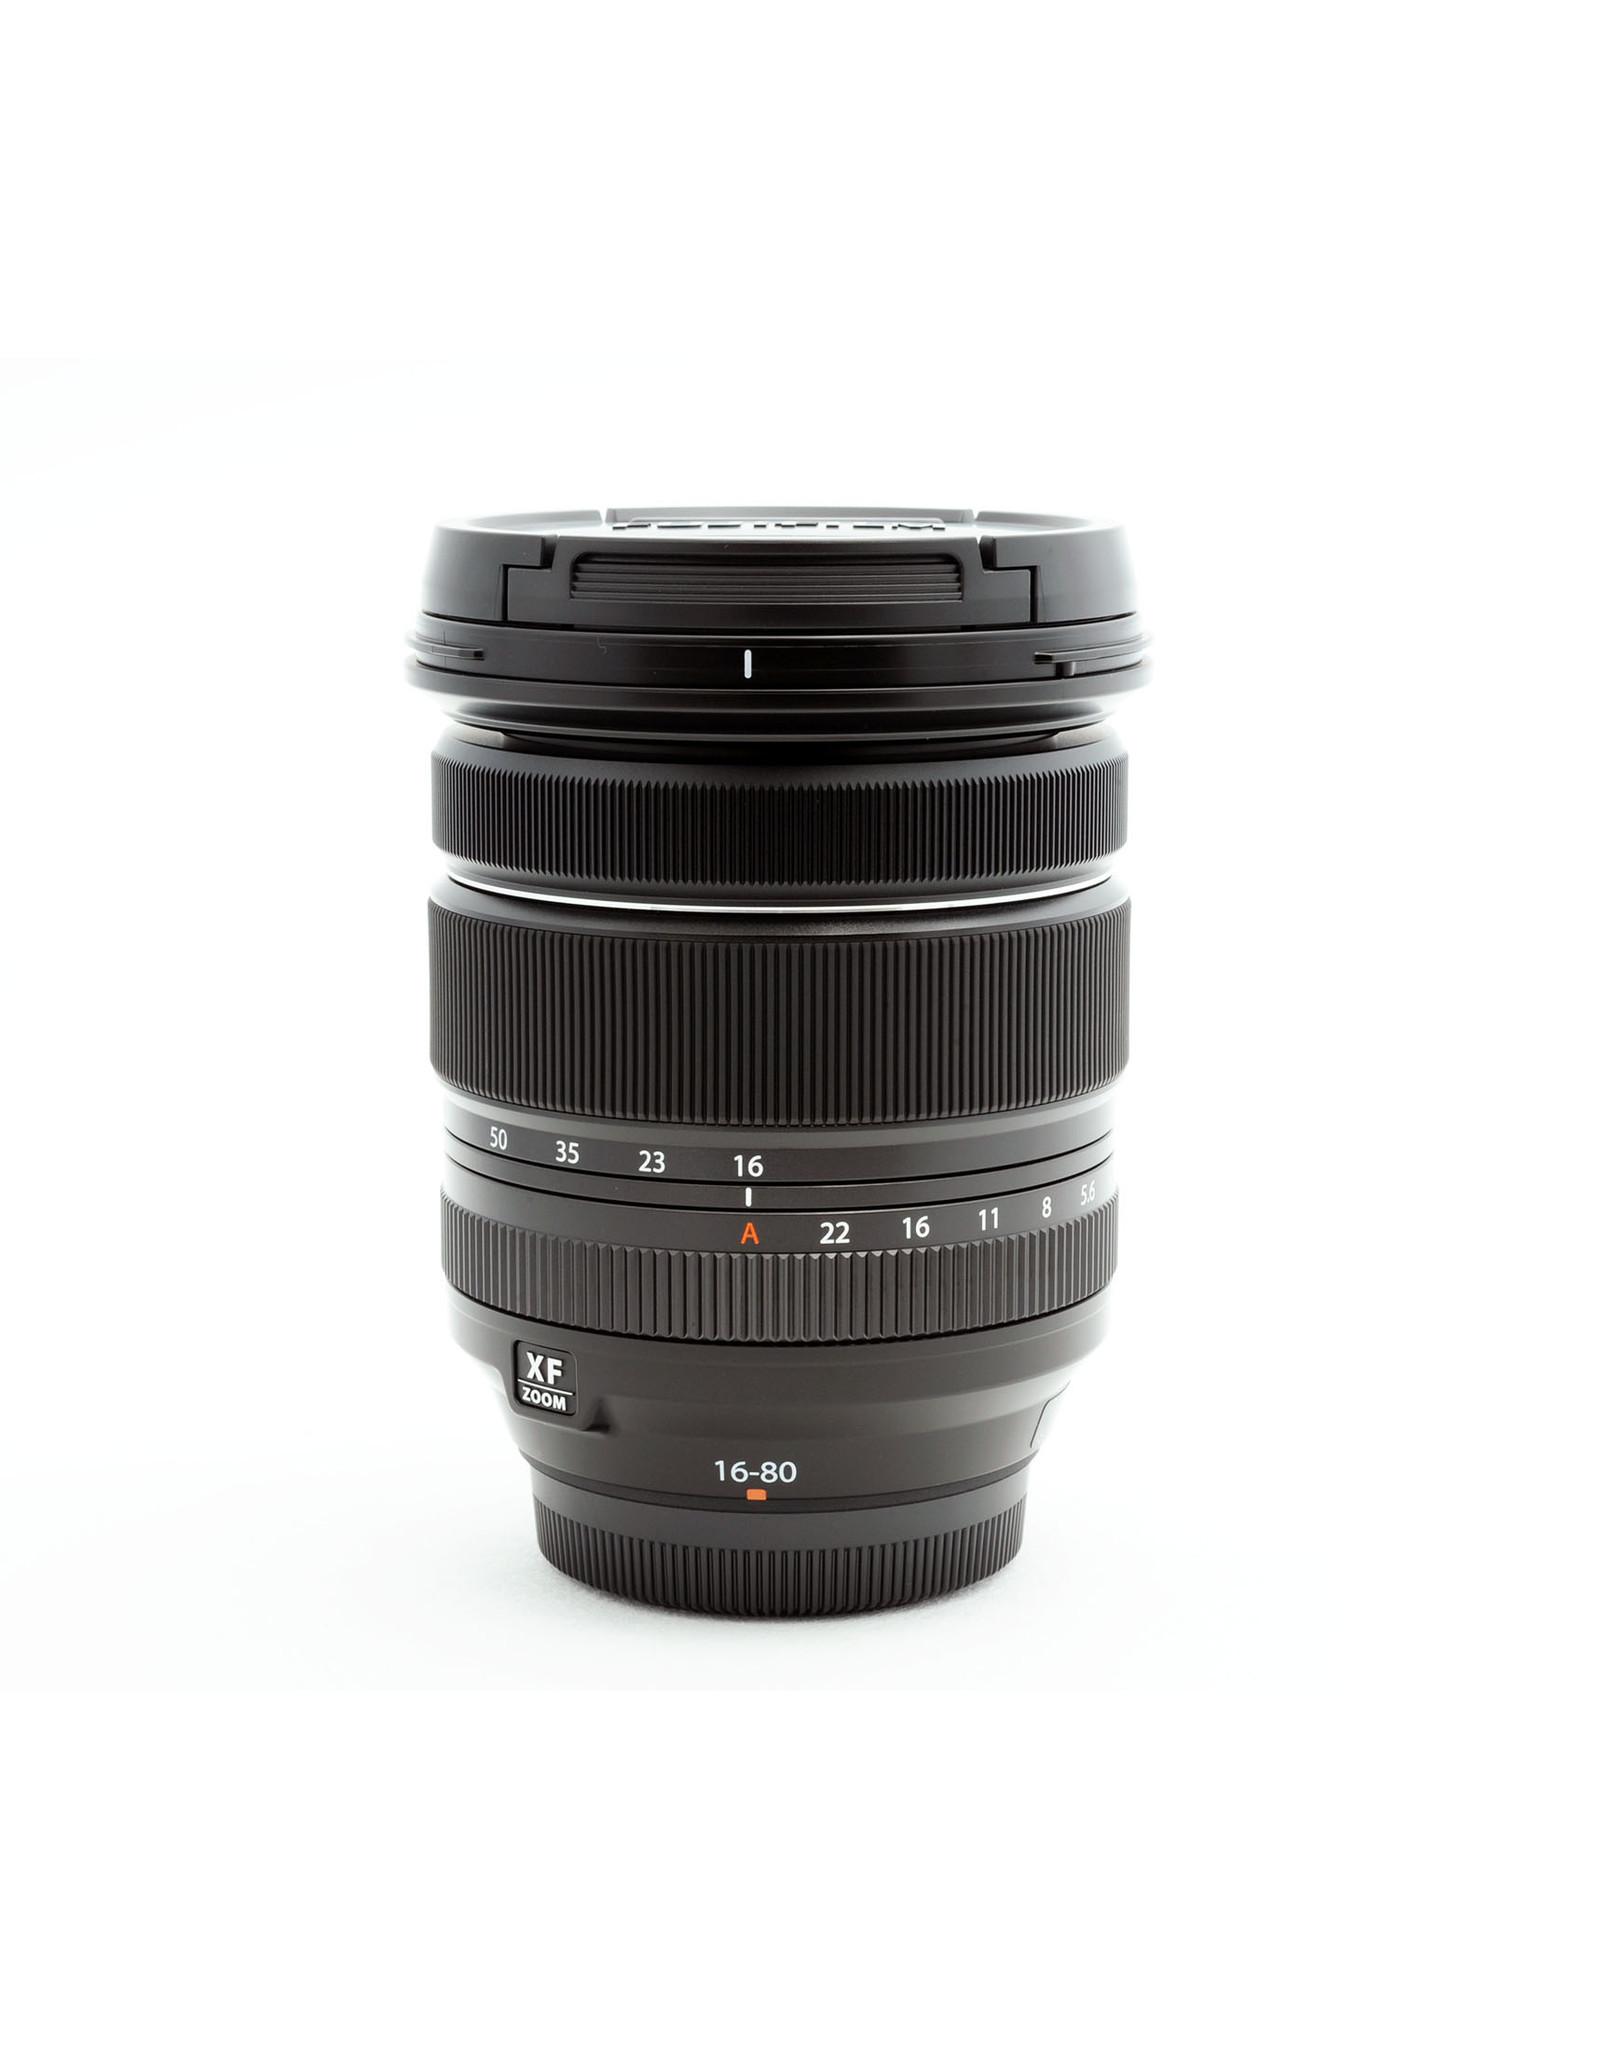 Fujifilm Fuji XF16-80mm f4 R LM OIS 16635625